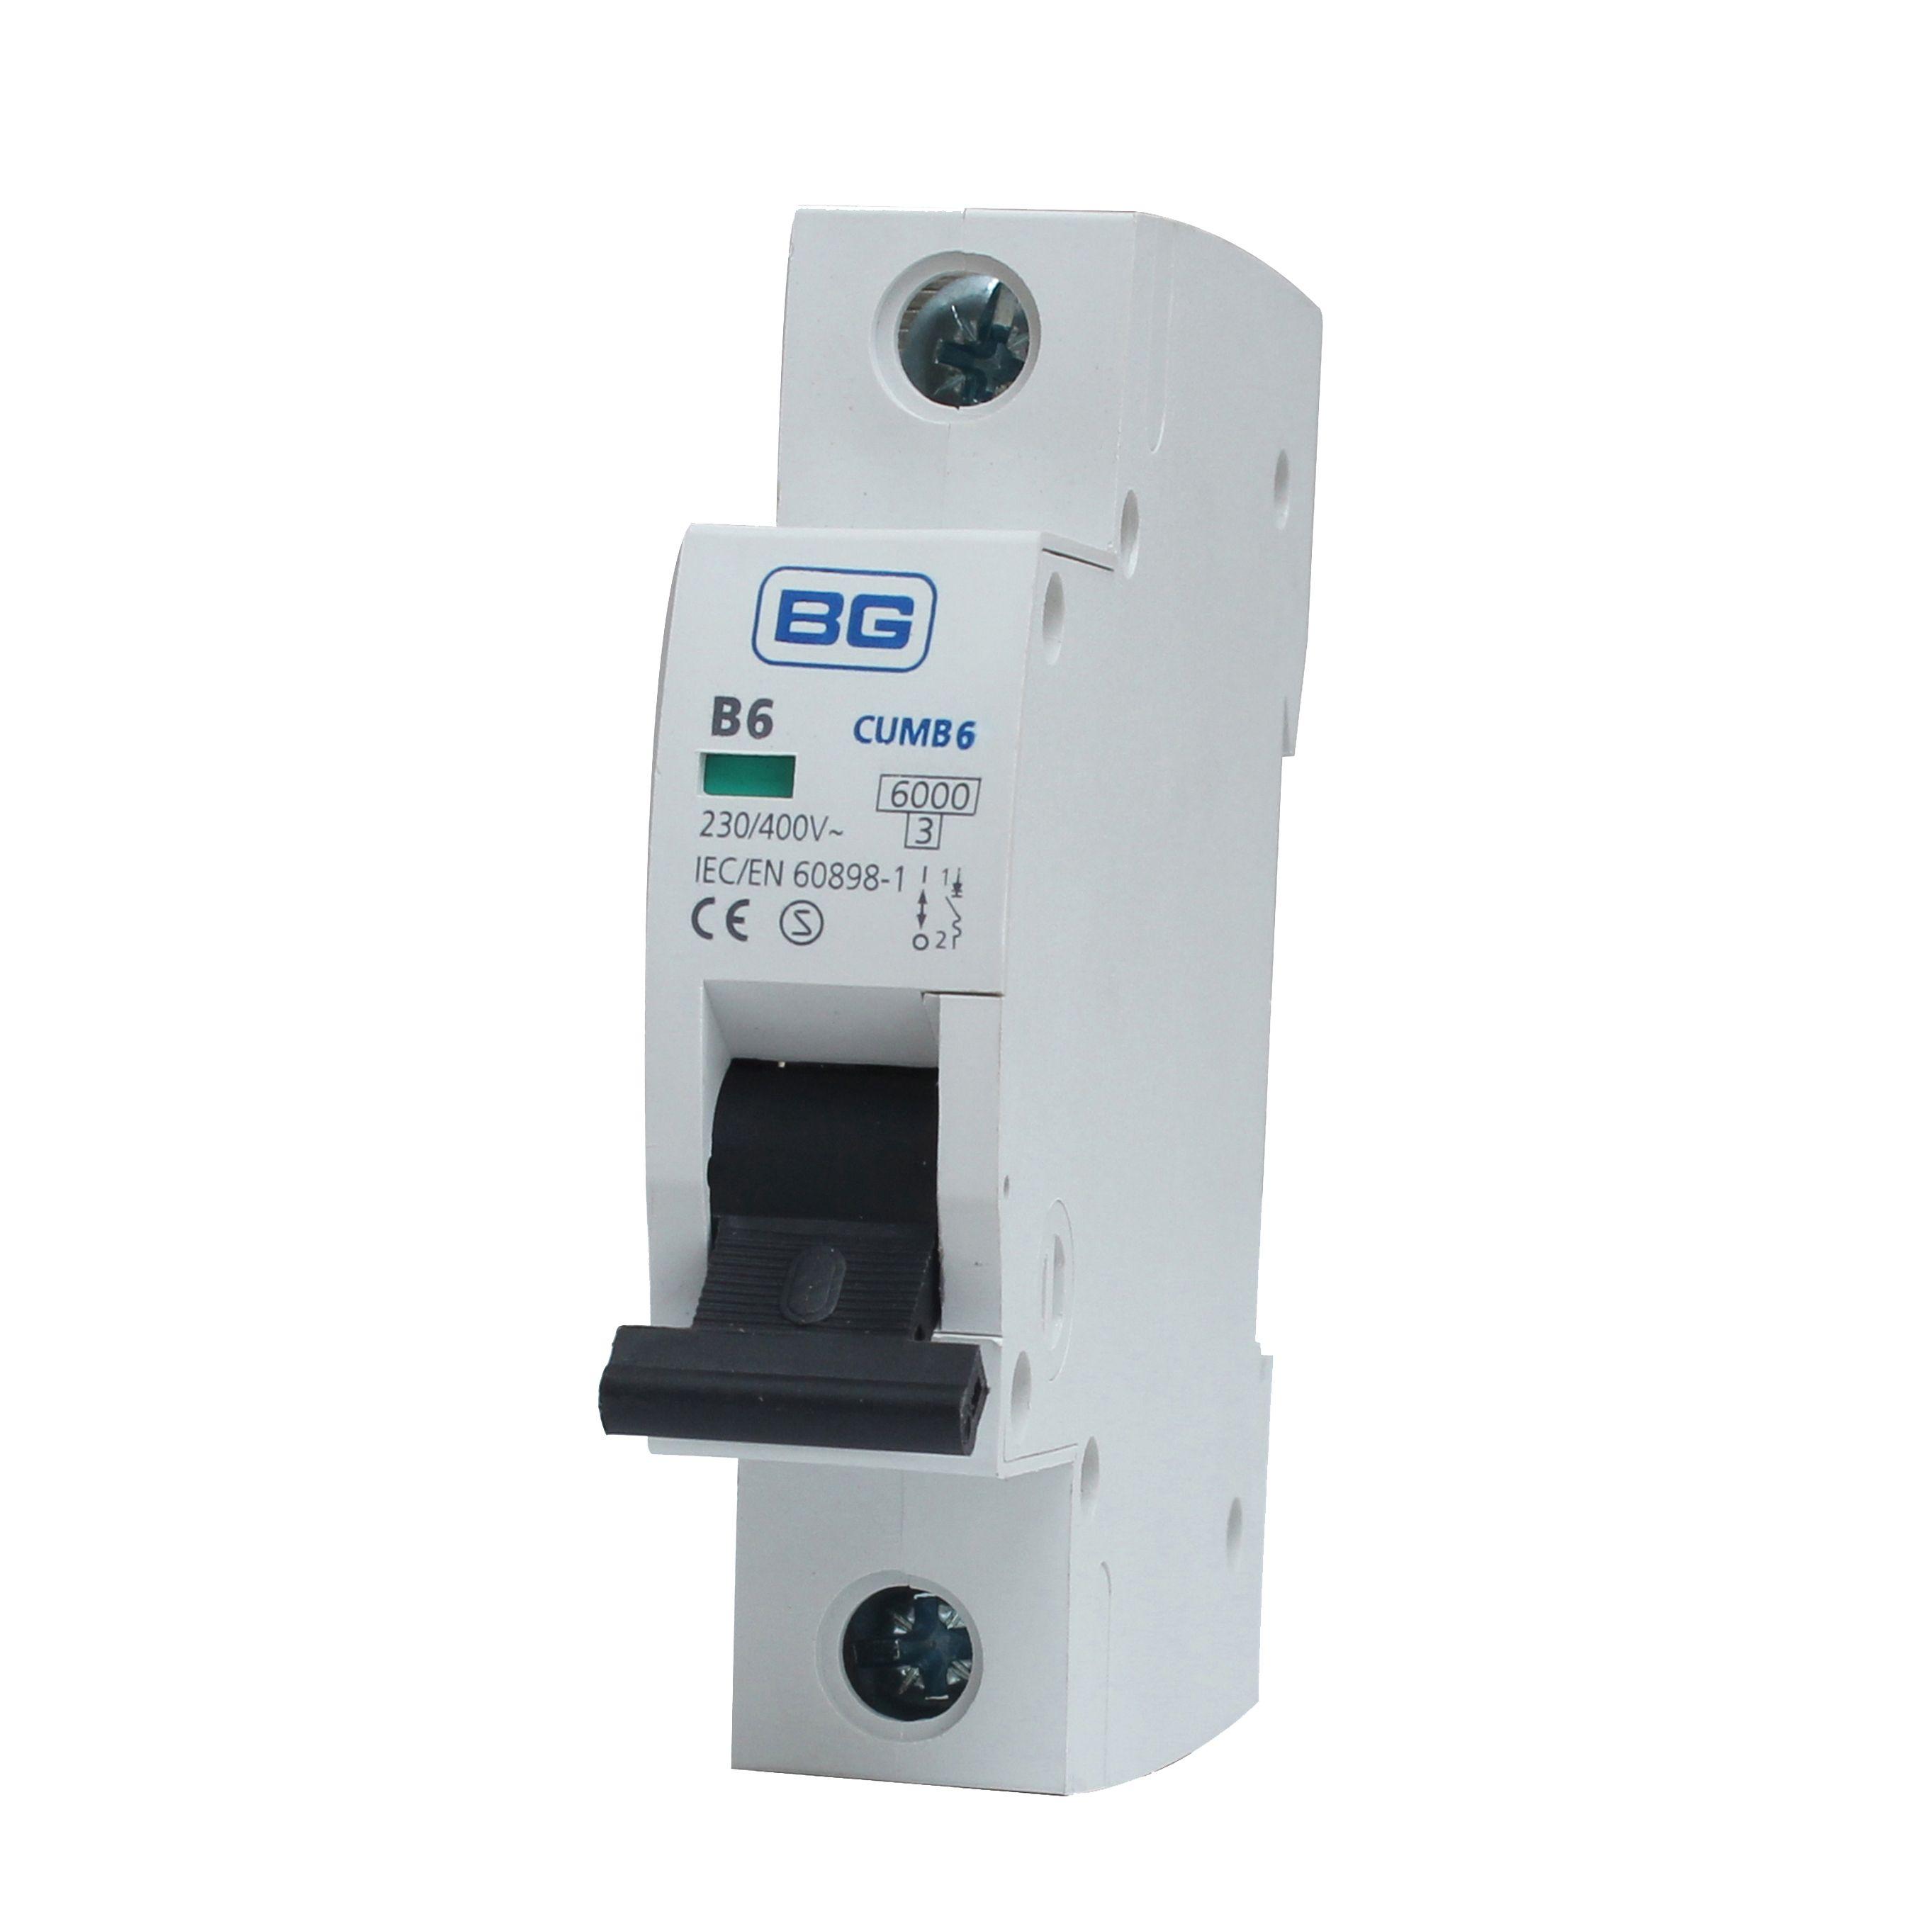 Bg 6a Mcb Miniature Circuit Breaker Departments Diy At Bq Wiring Accessories